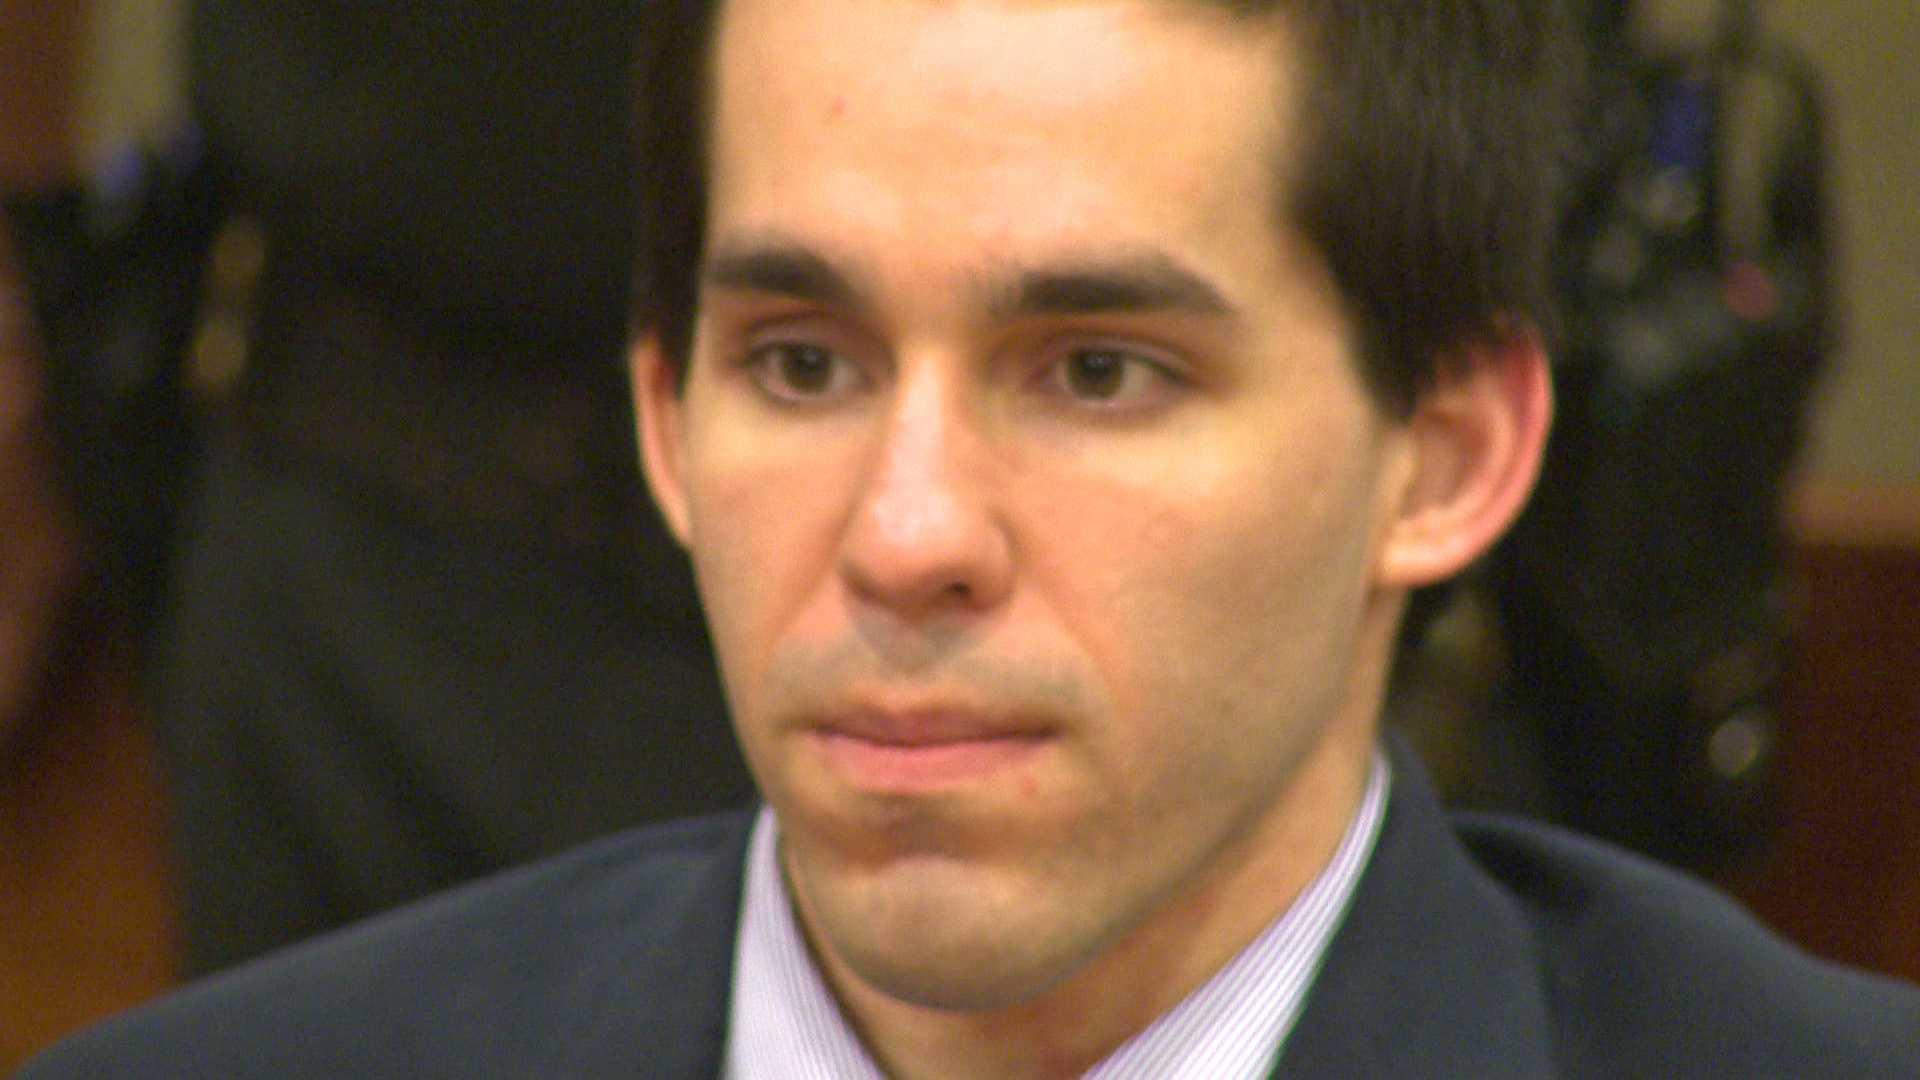 Ryan Douglas Roberts listens as the verdict is read in his murder trial.